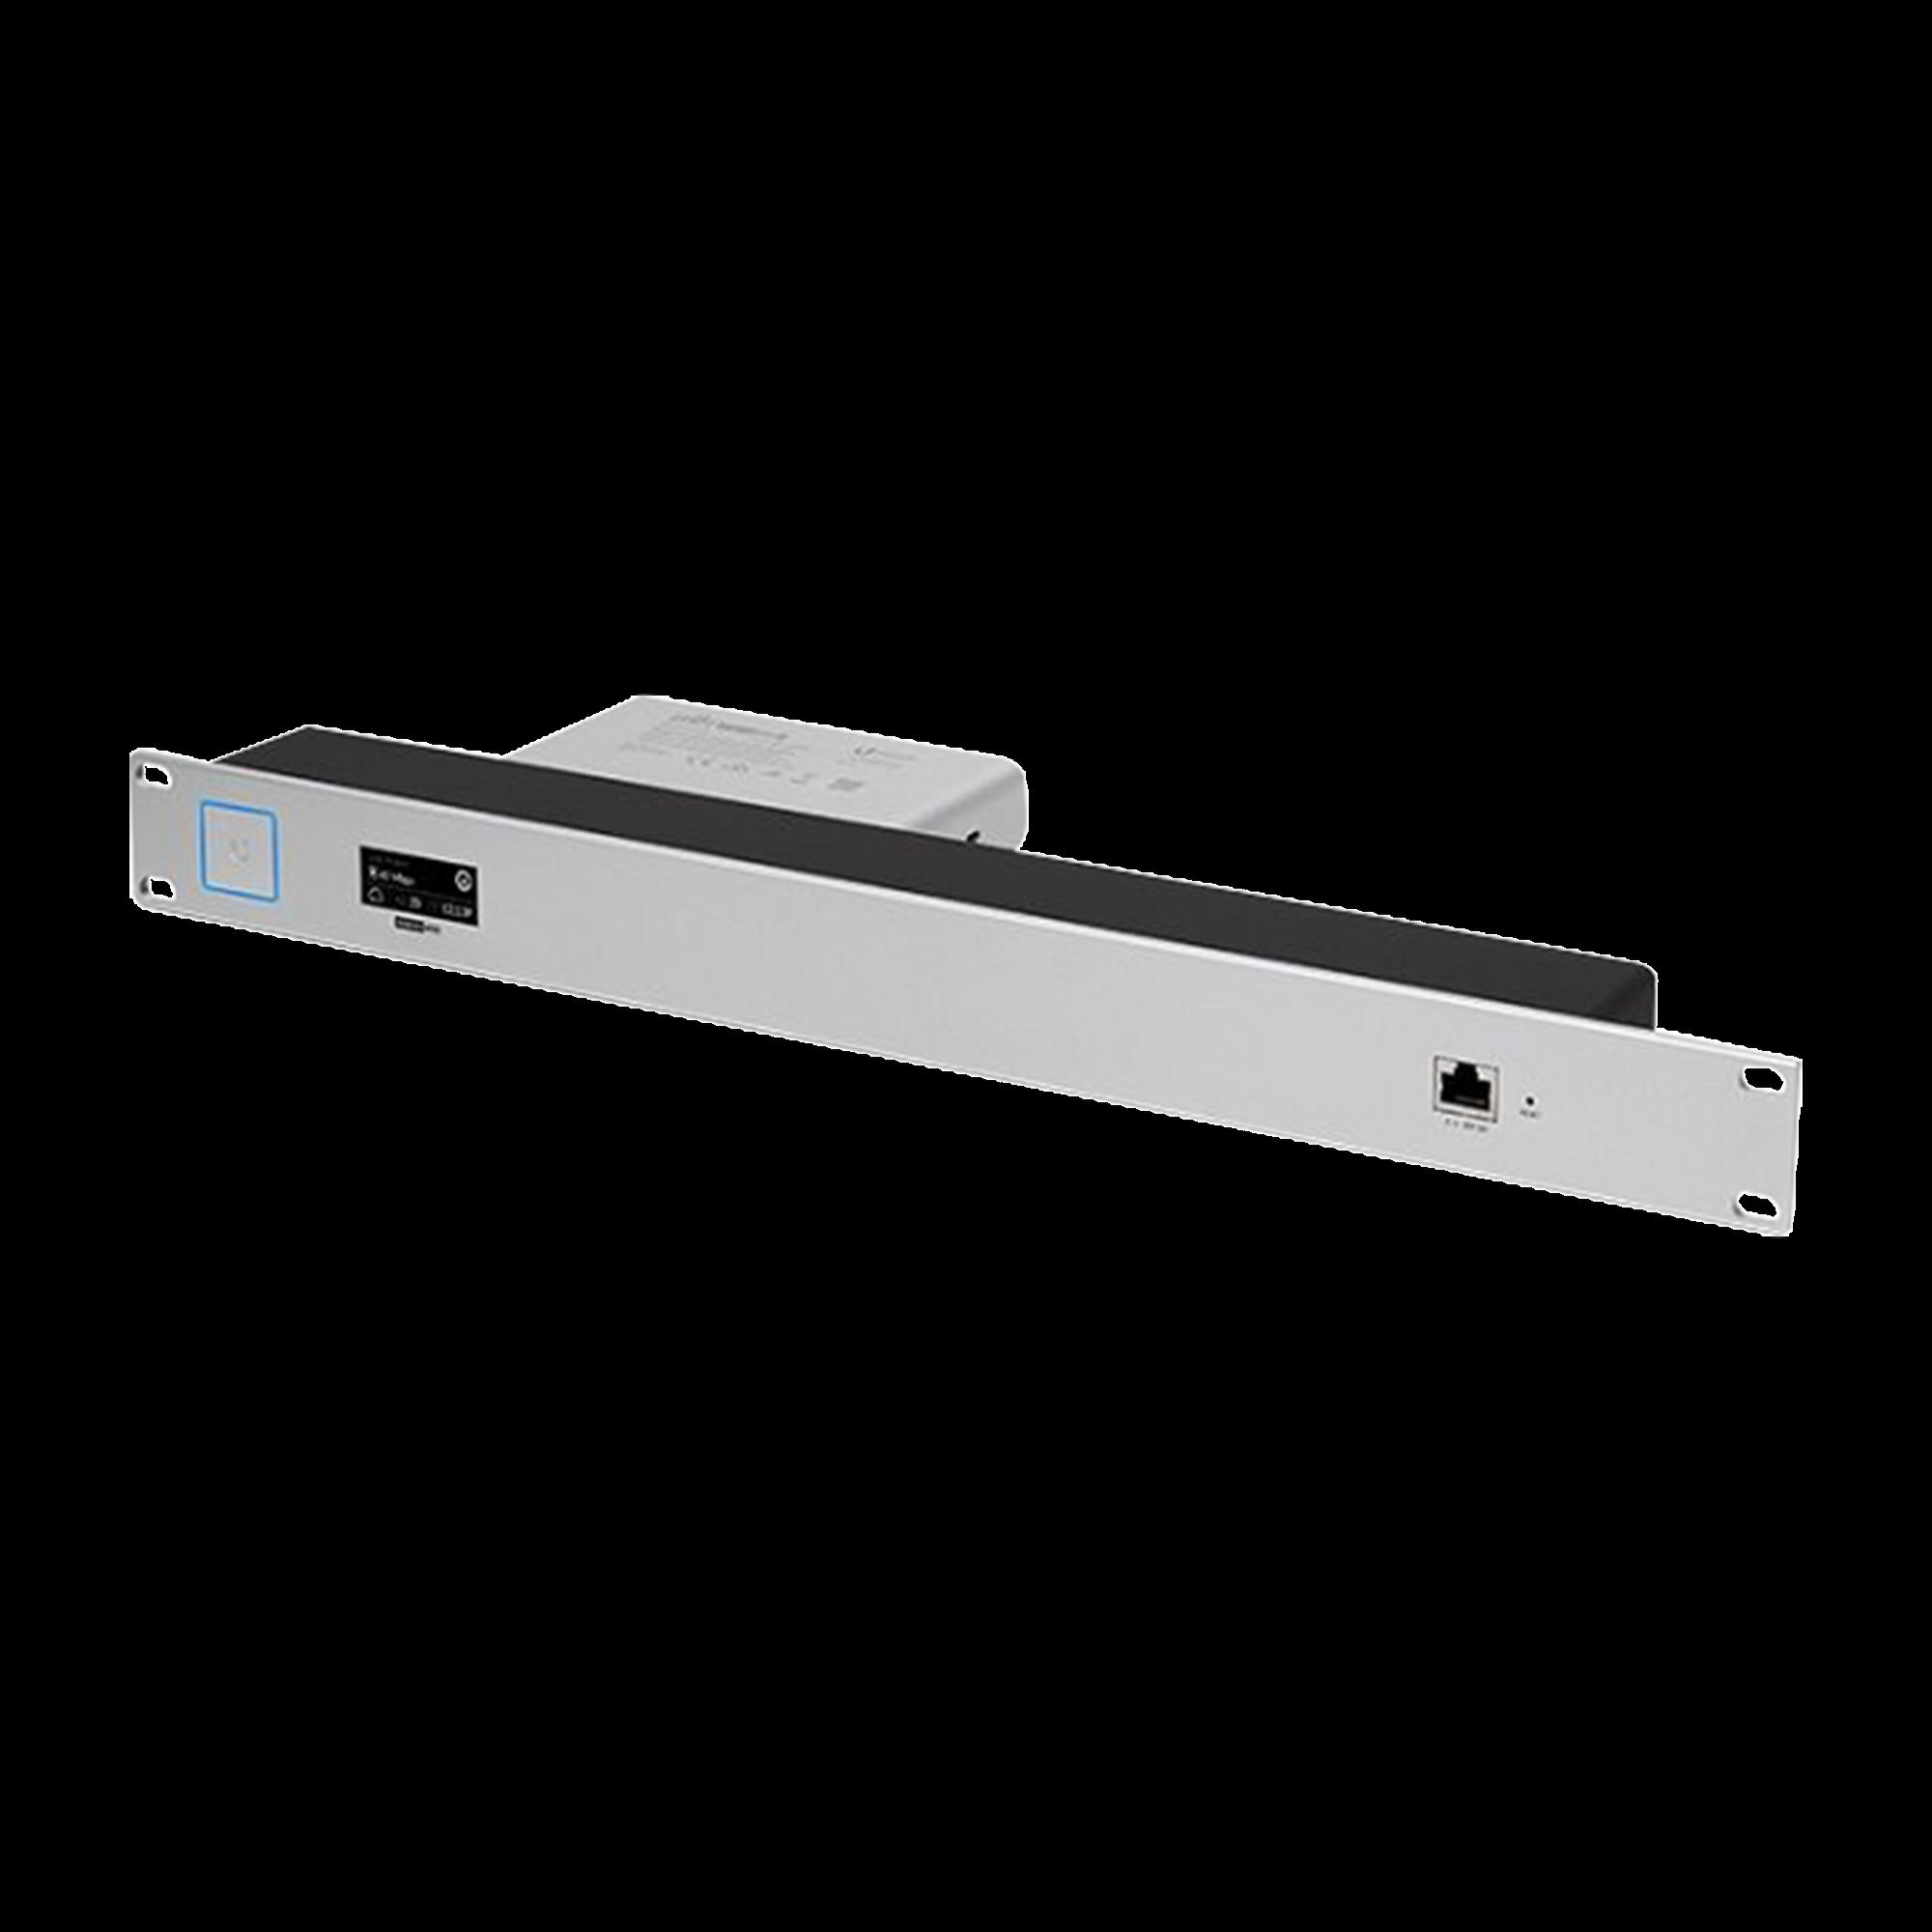 Montaje UniFi para controladores UCK-G2 o UCK-G2-PLUS en Rack de 19